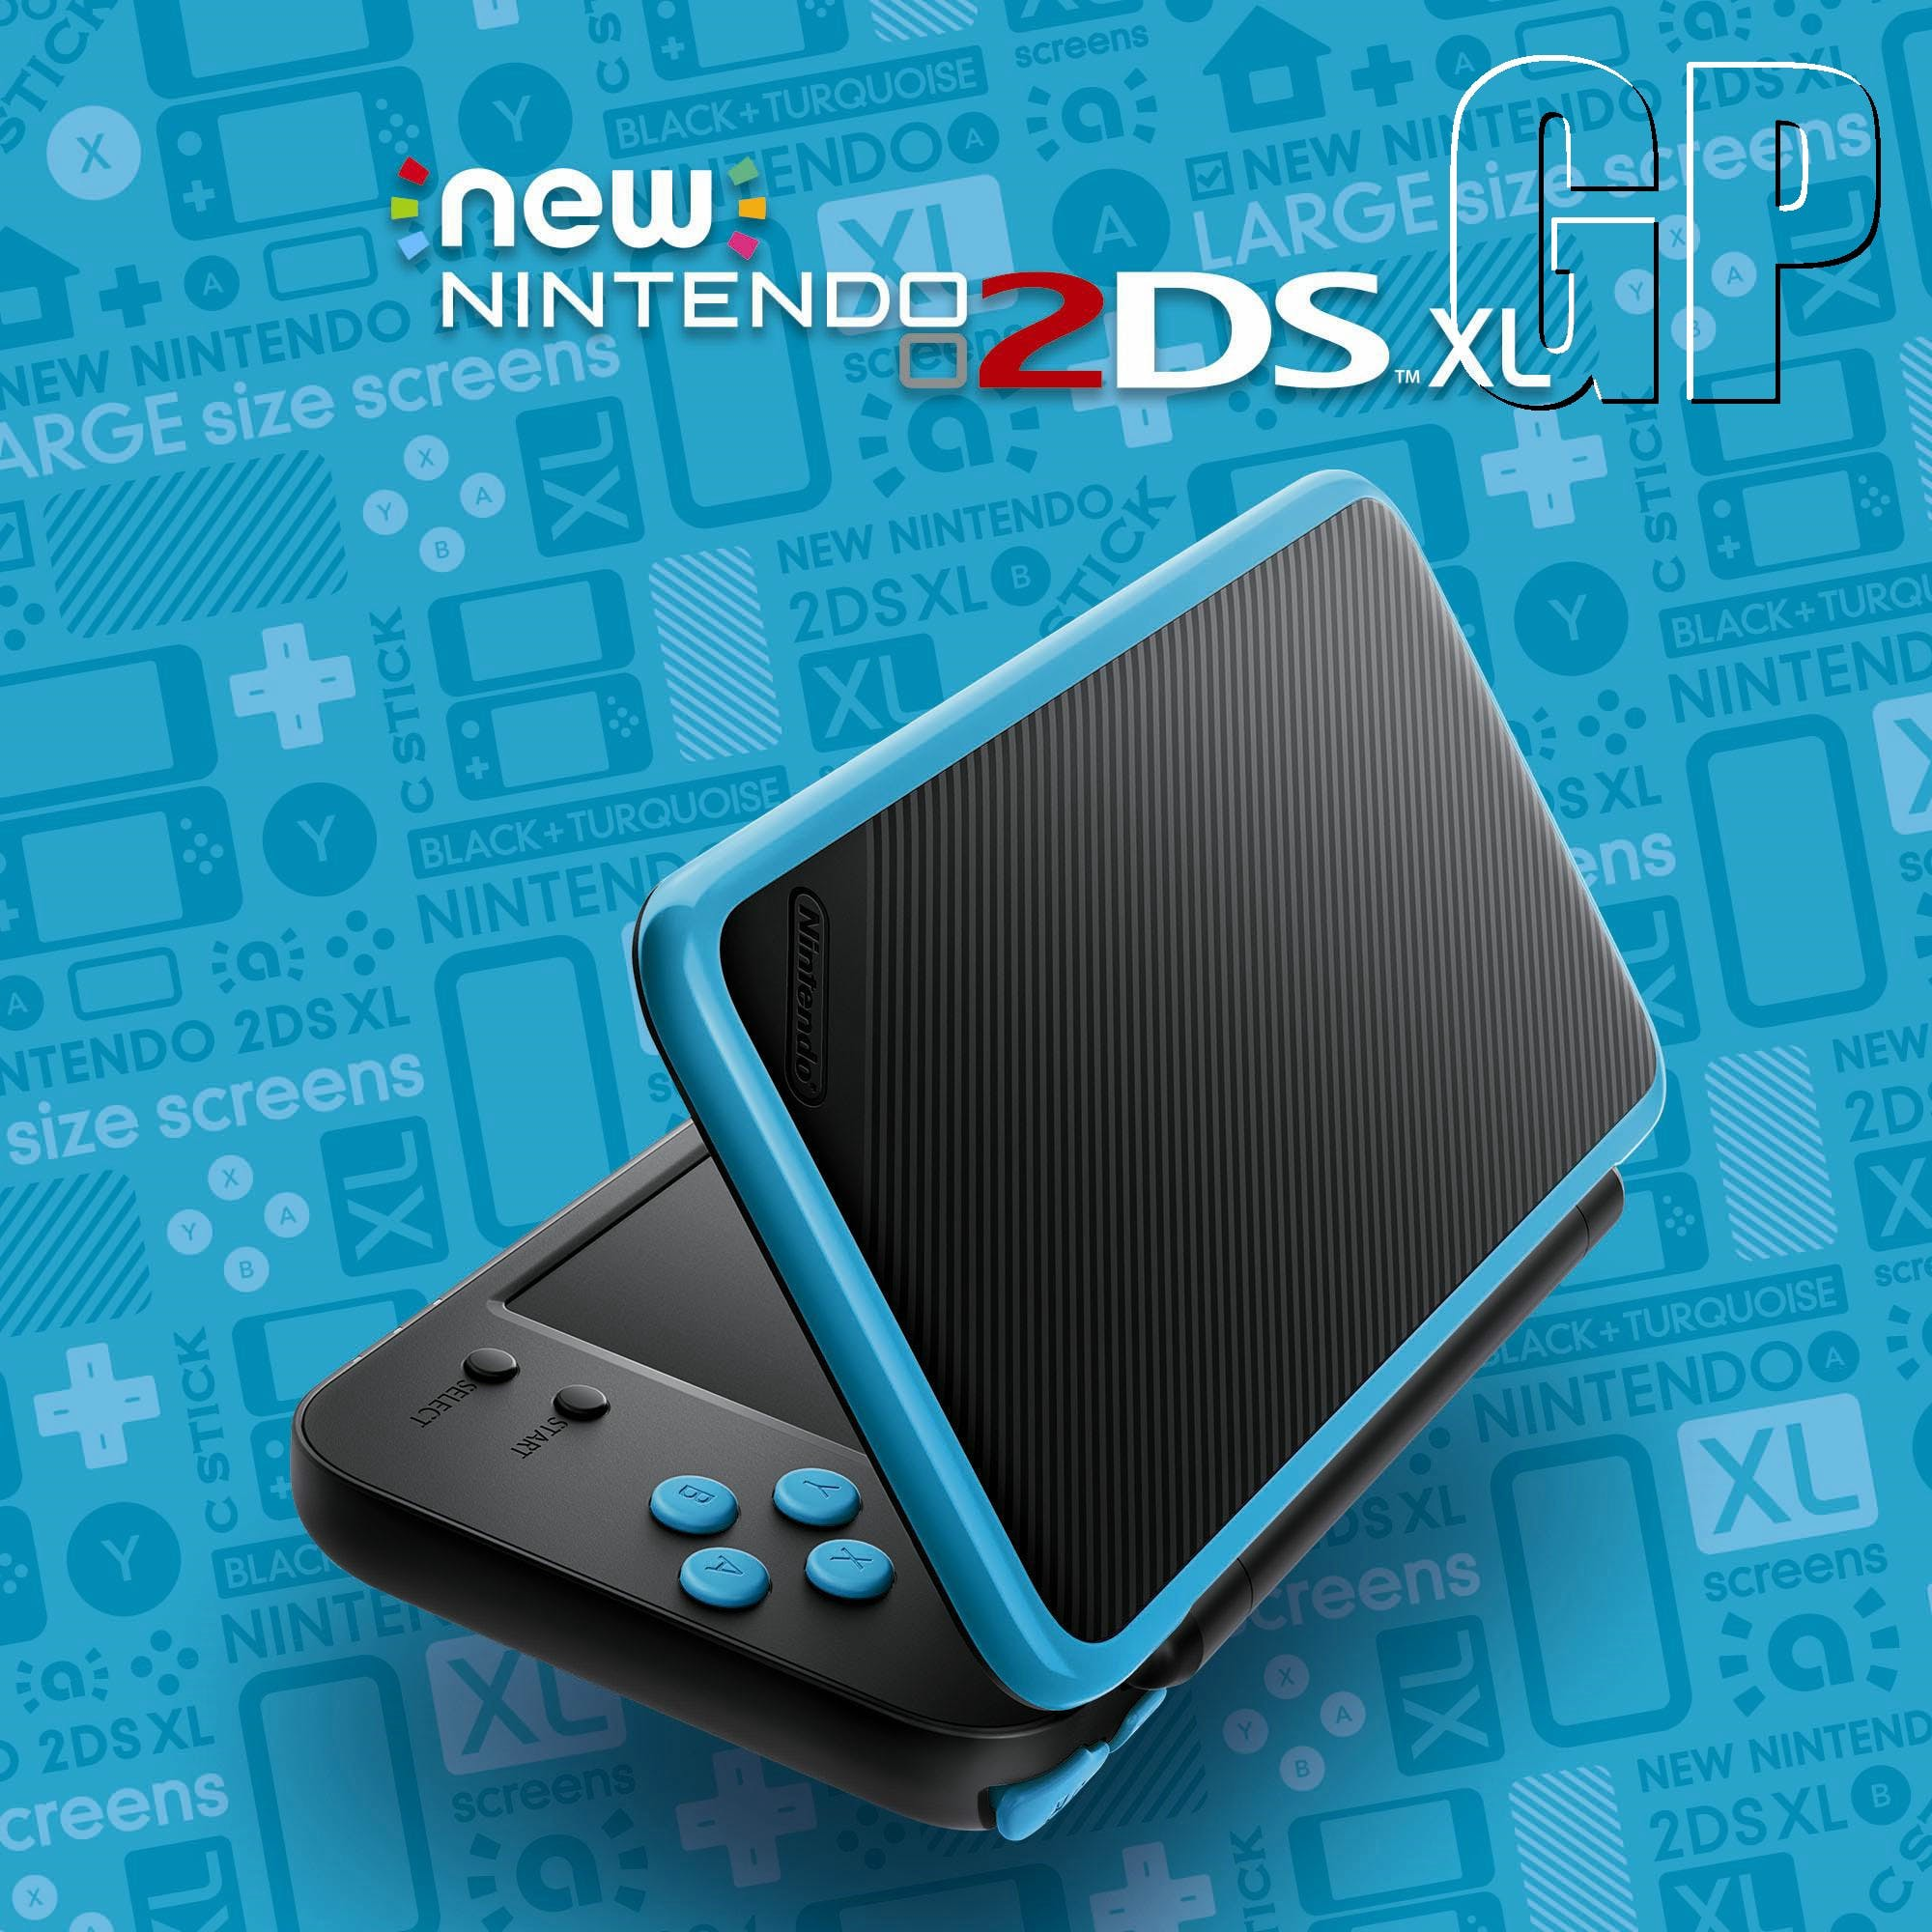 new 2DSxl